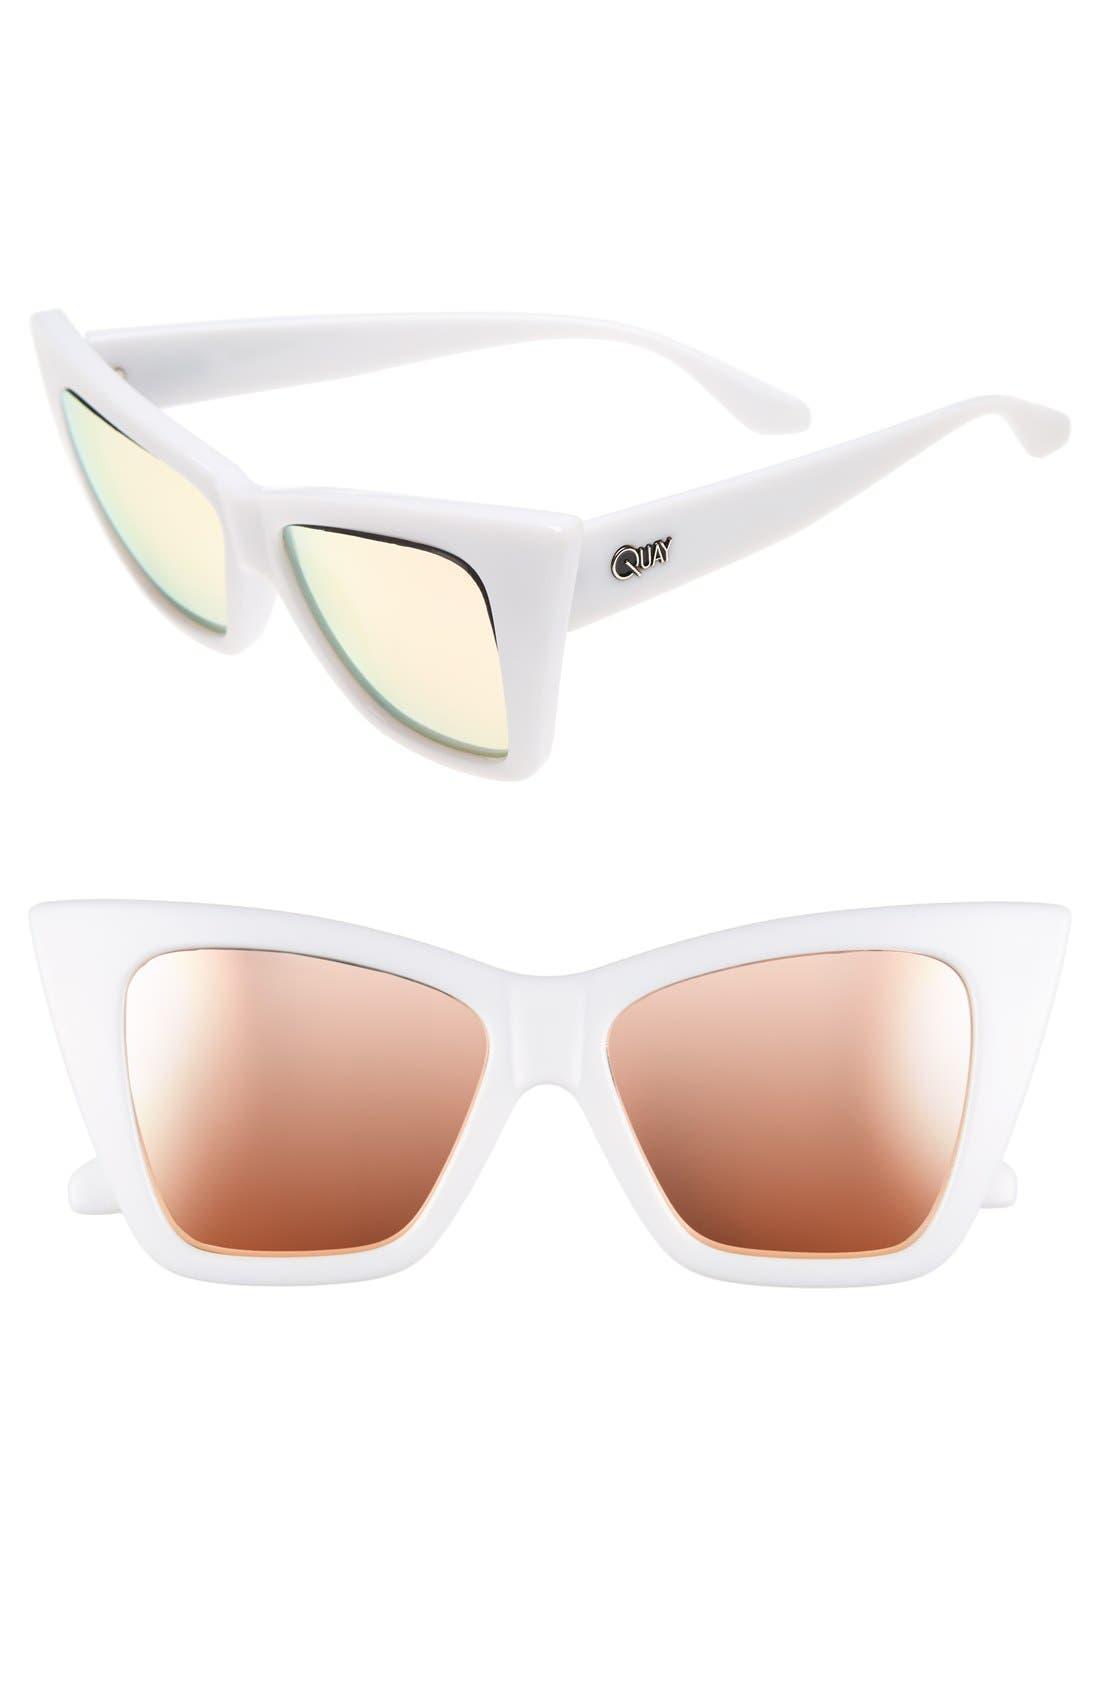 Main Image - Quay Australia 56mm 'Vesper' Exaggerated Cat Eye Sunglasses